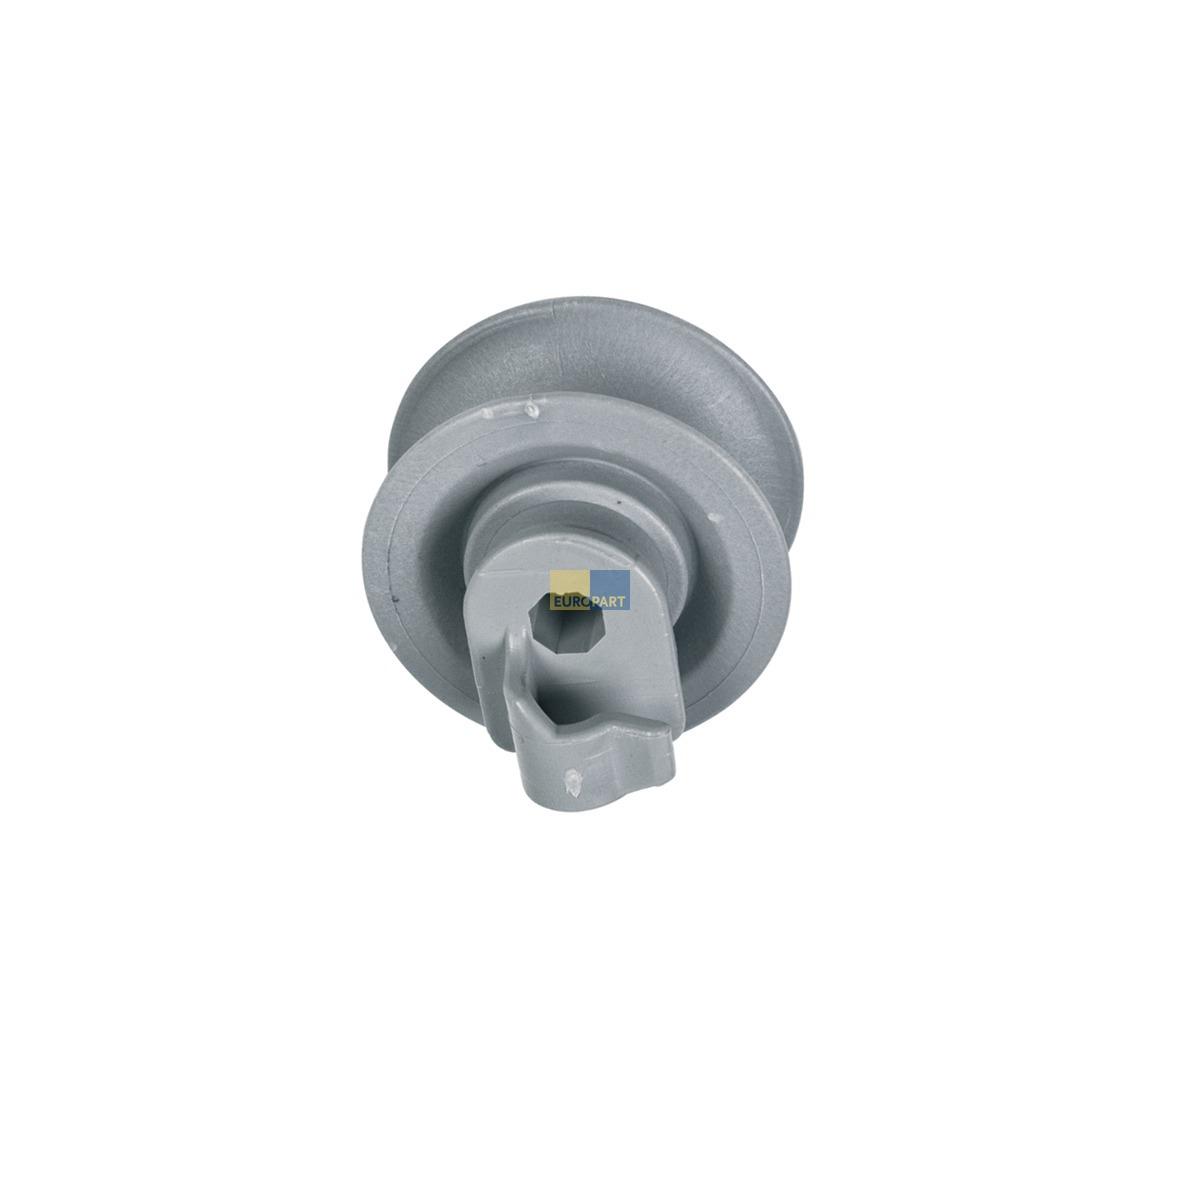 Korbrolle Oberkorb Geschirrspüler passend wie Bosch Siemens 00165313 165313